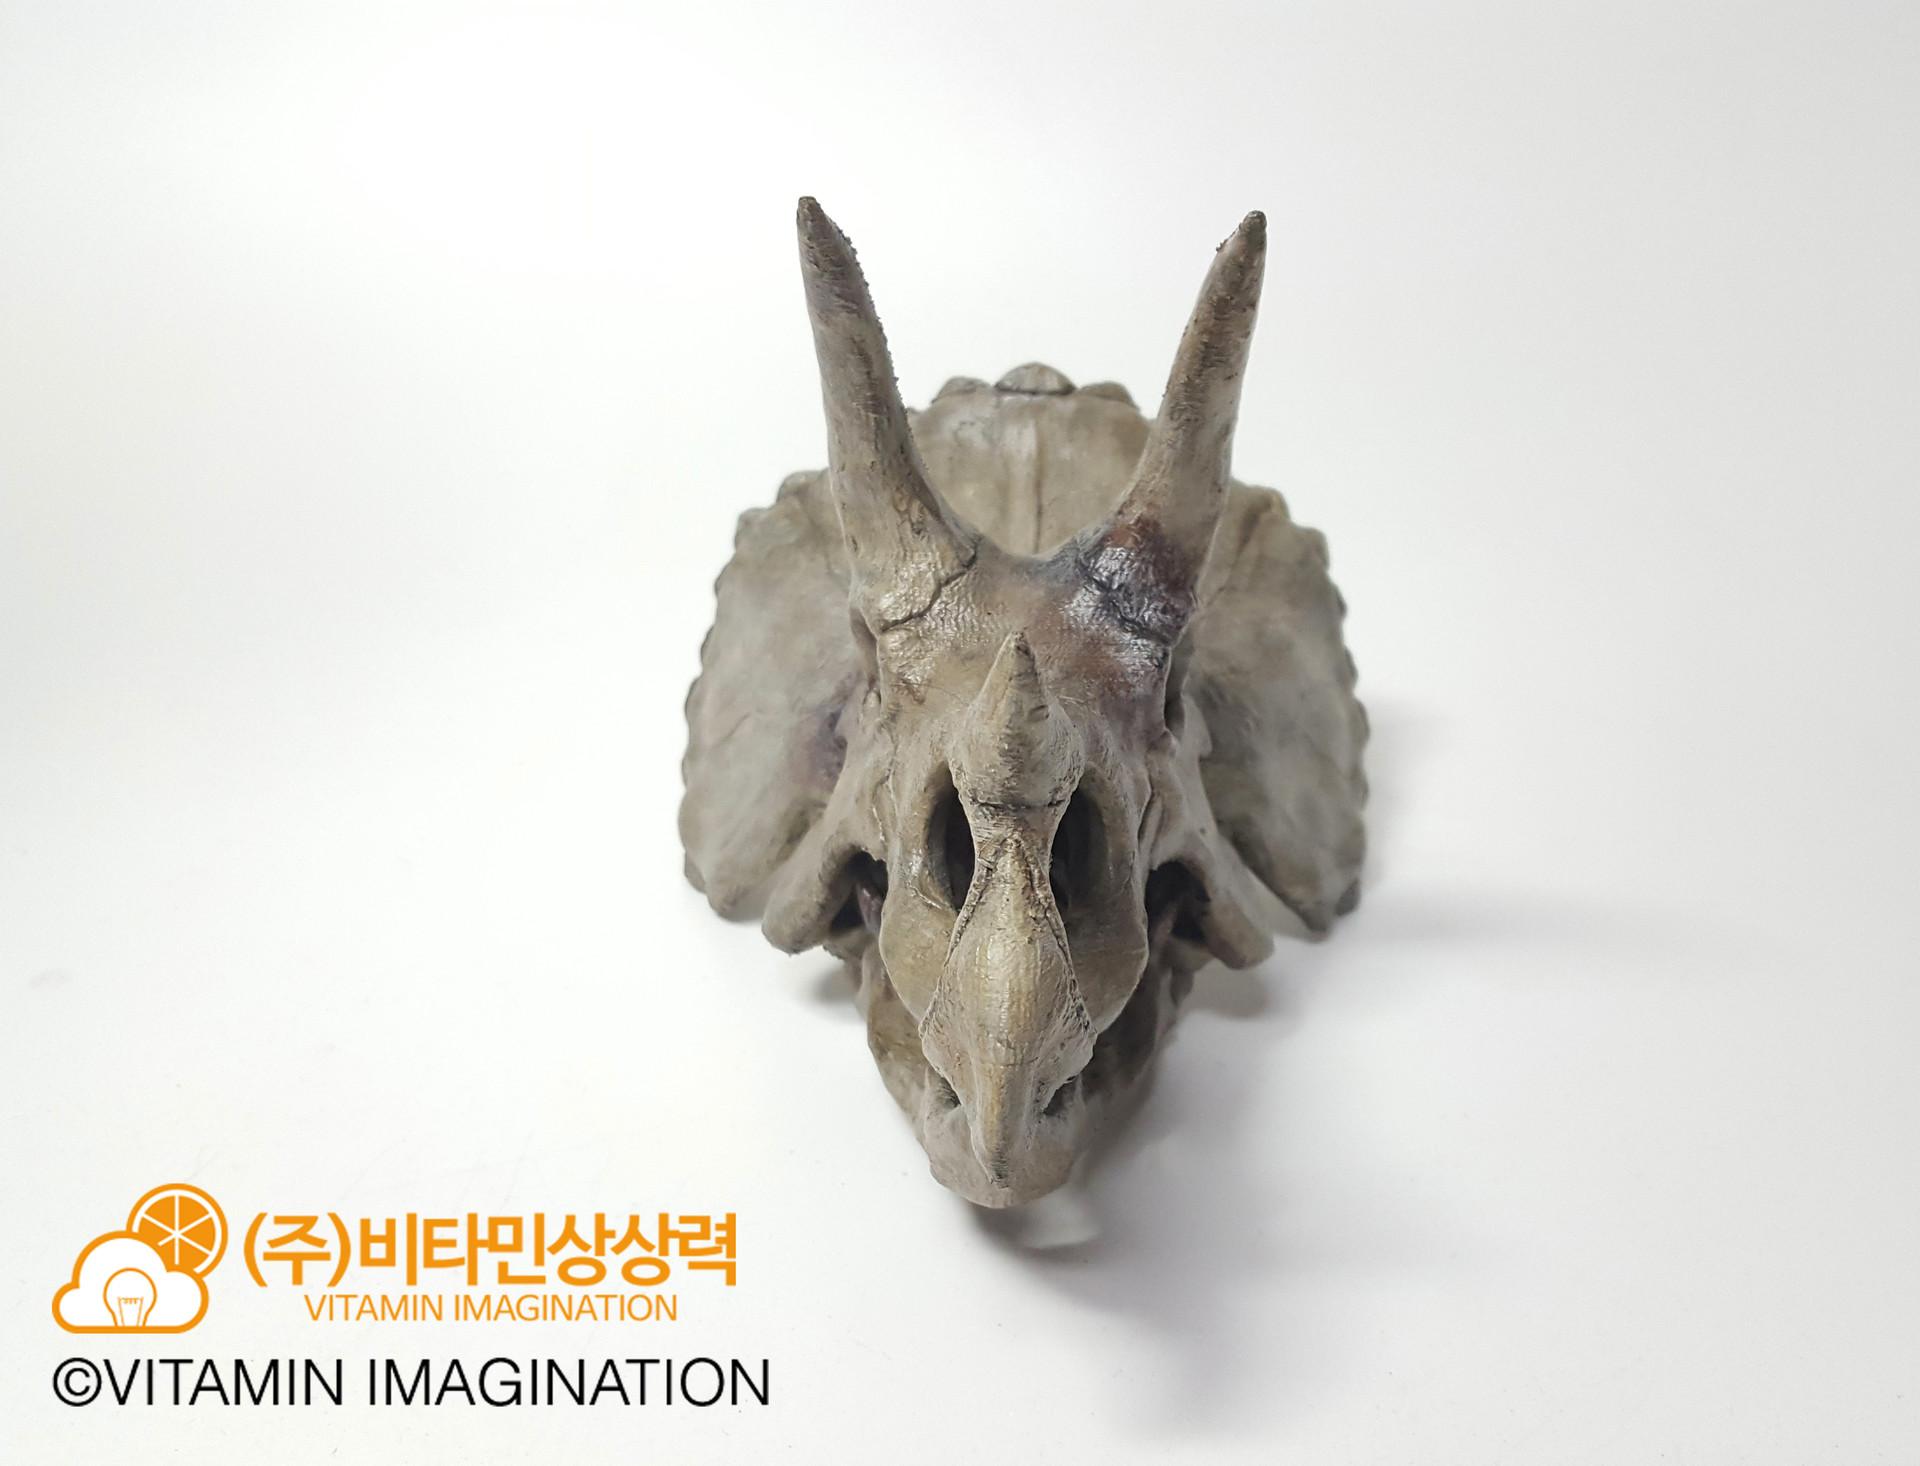 Vitamin imagination kakaotalk moim 4fhilaktf2i4hhkp44or60xie7b7d8